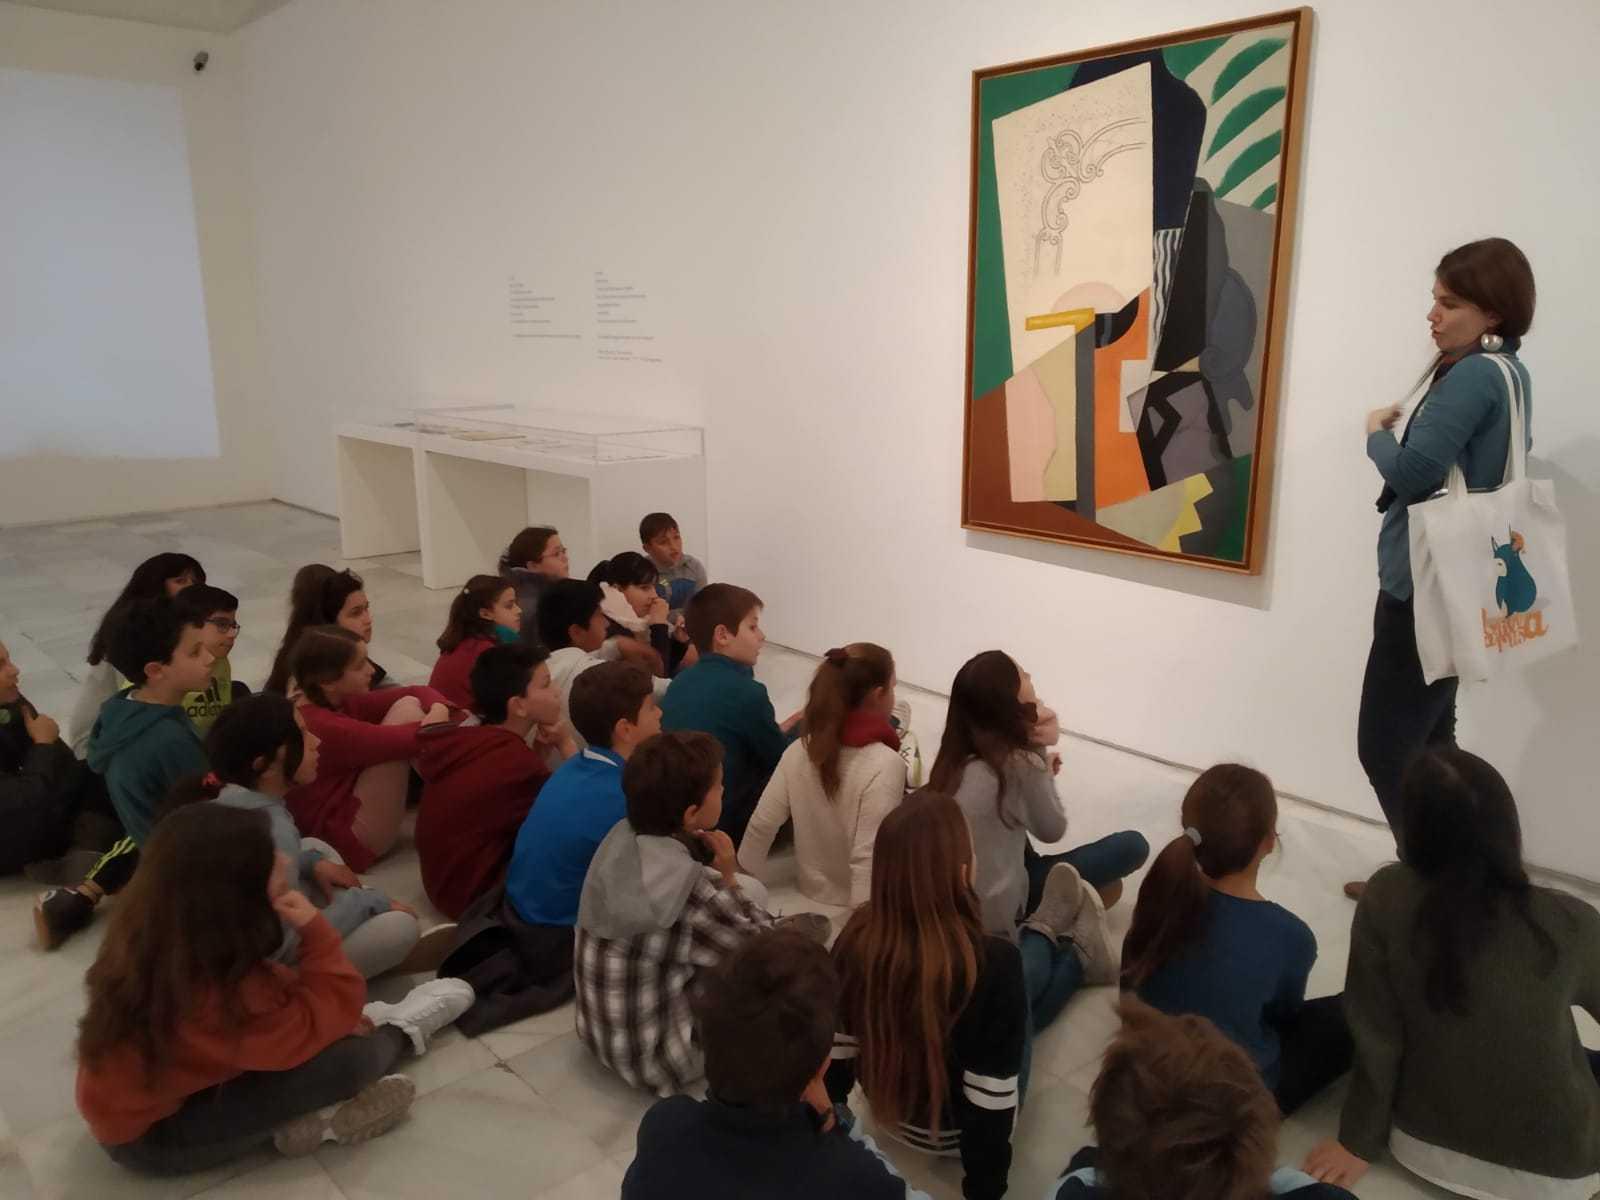 2019_02_07_Quinto visita Museo Reina Sofia_CEIP FDLR_Las Rozas 6